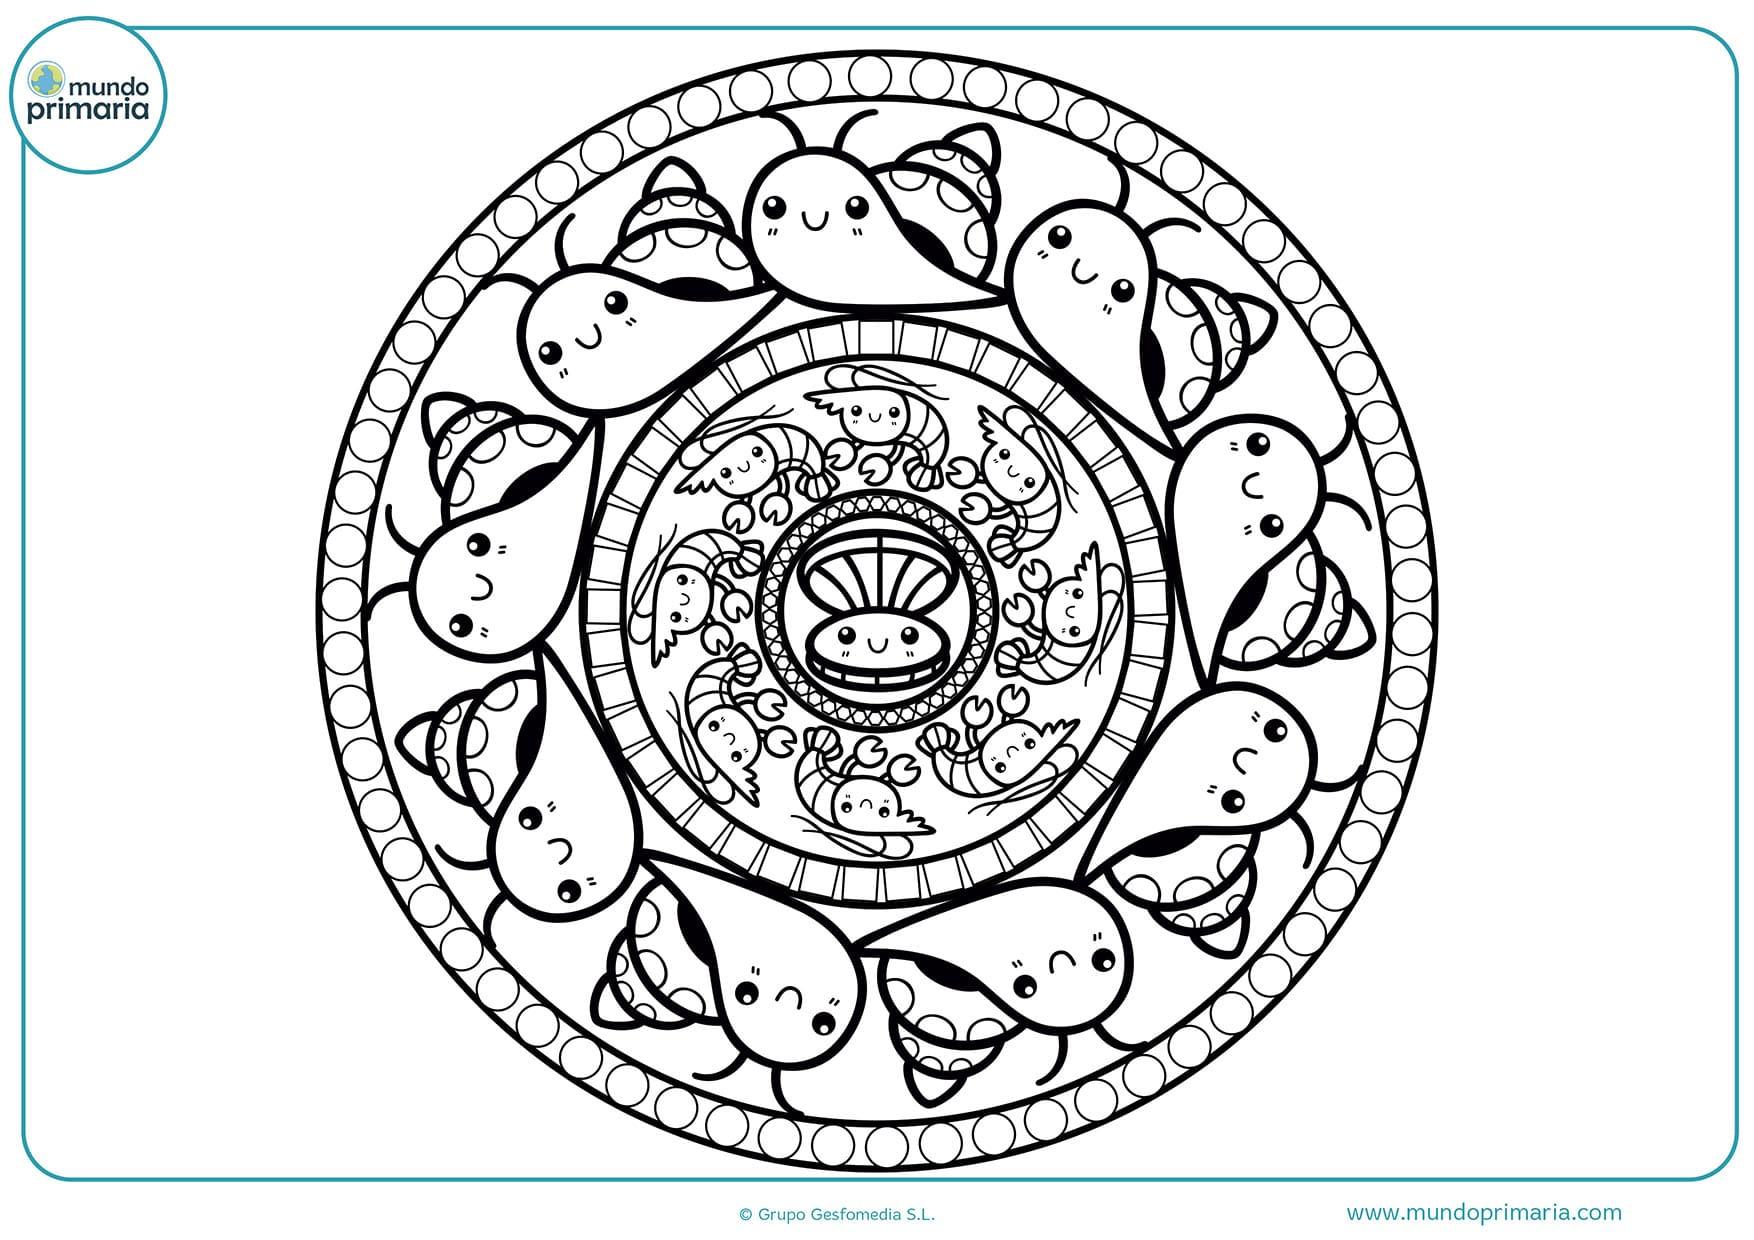 Colorear dibujos mandalas animales